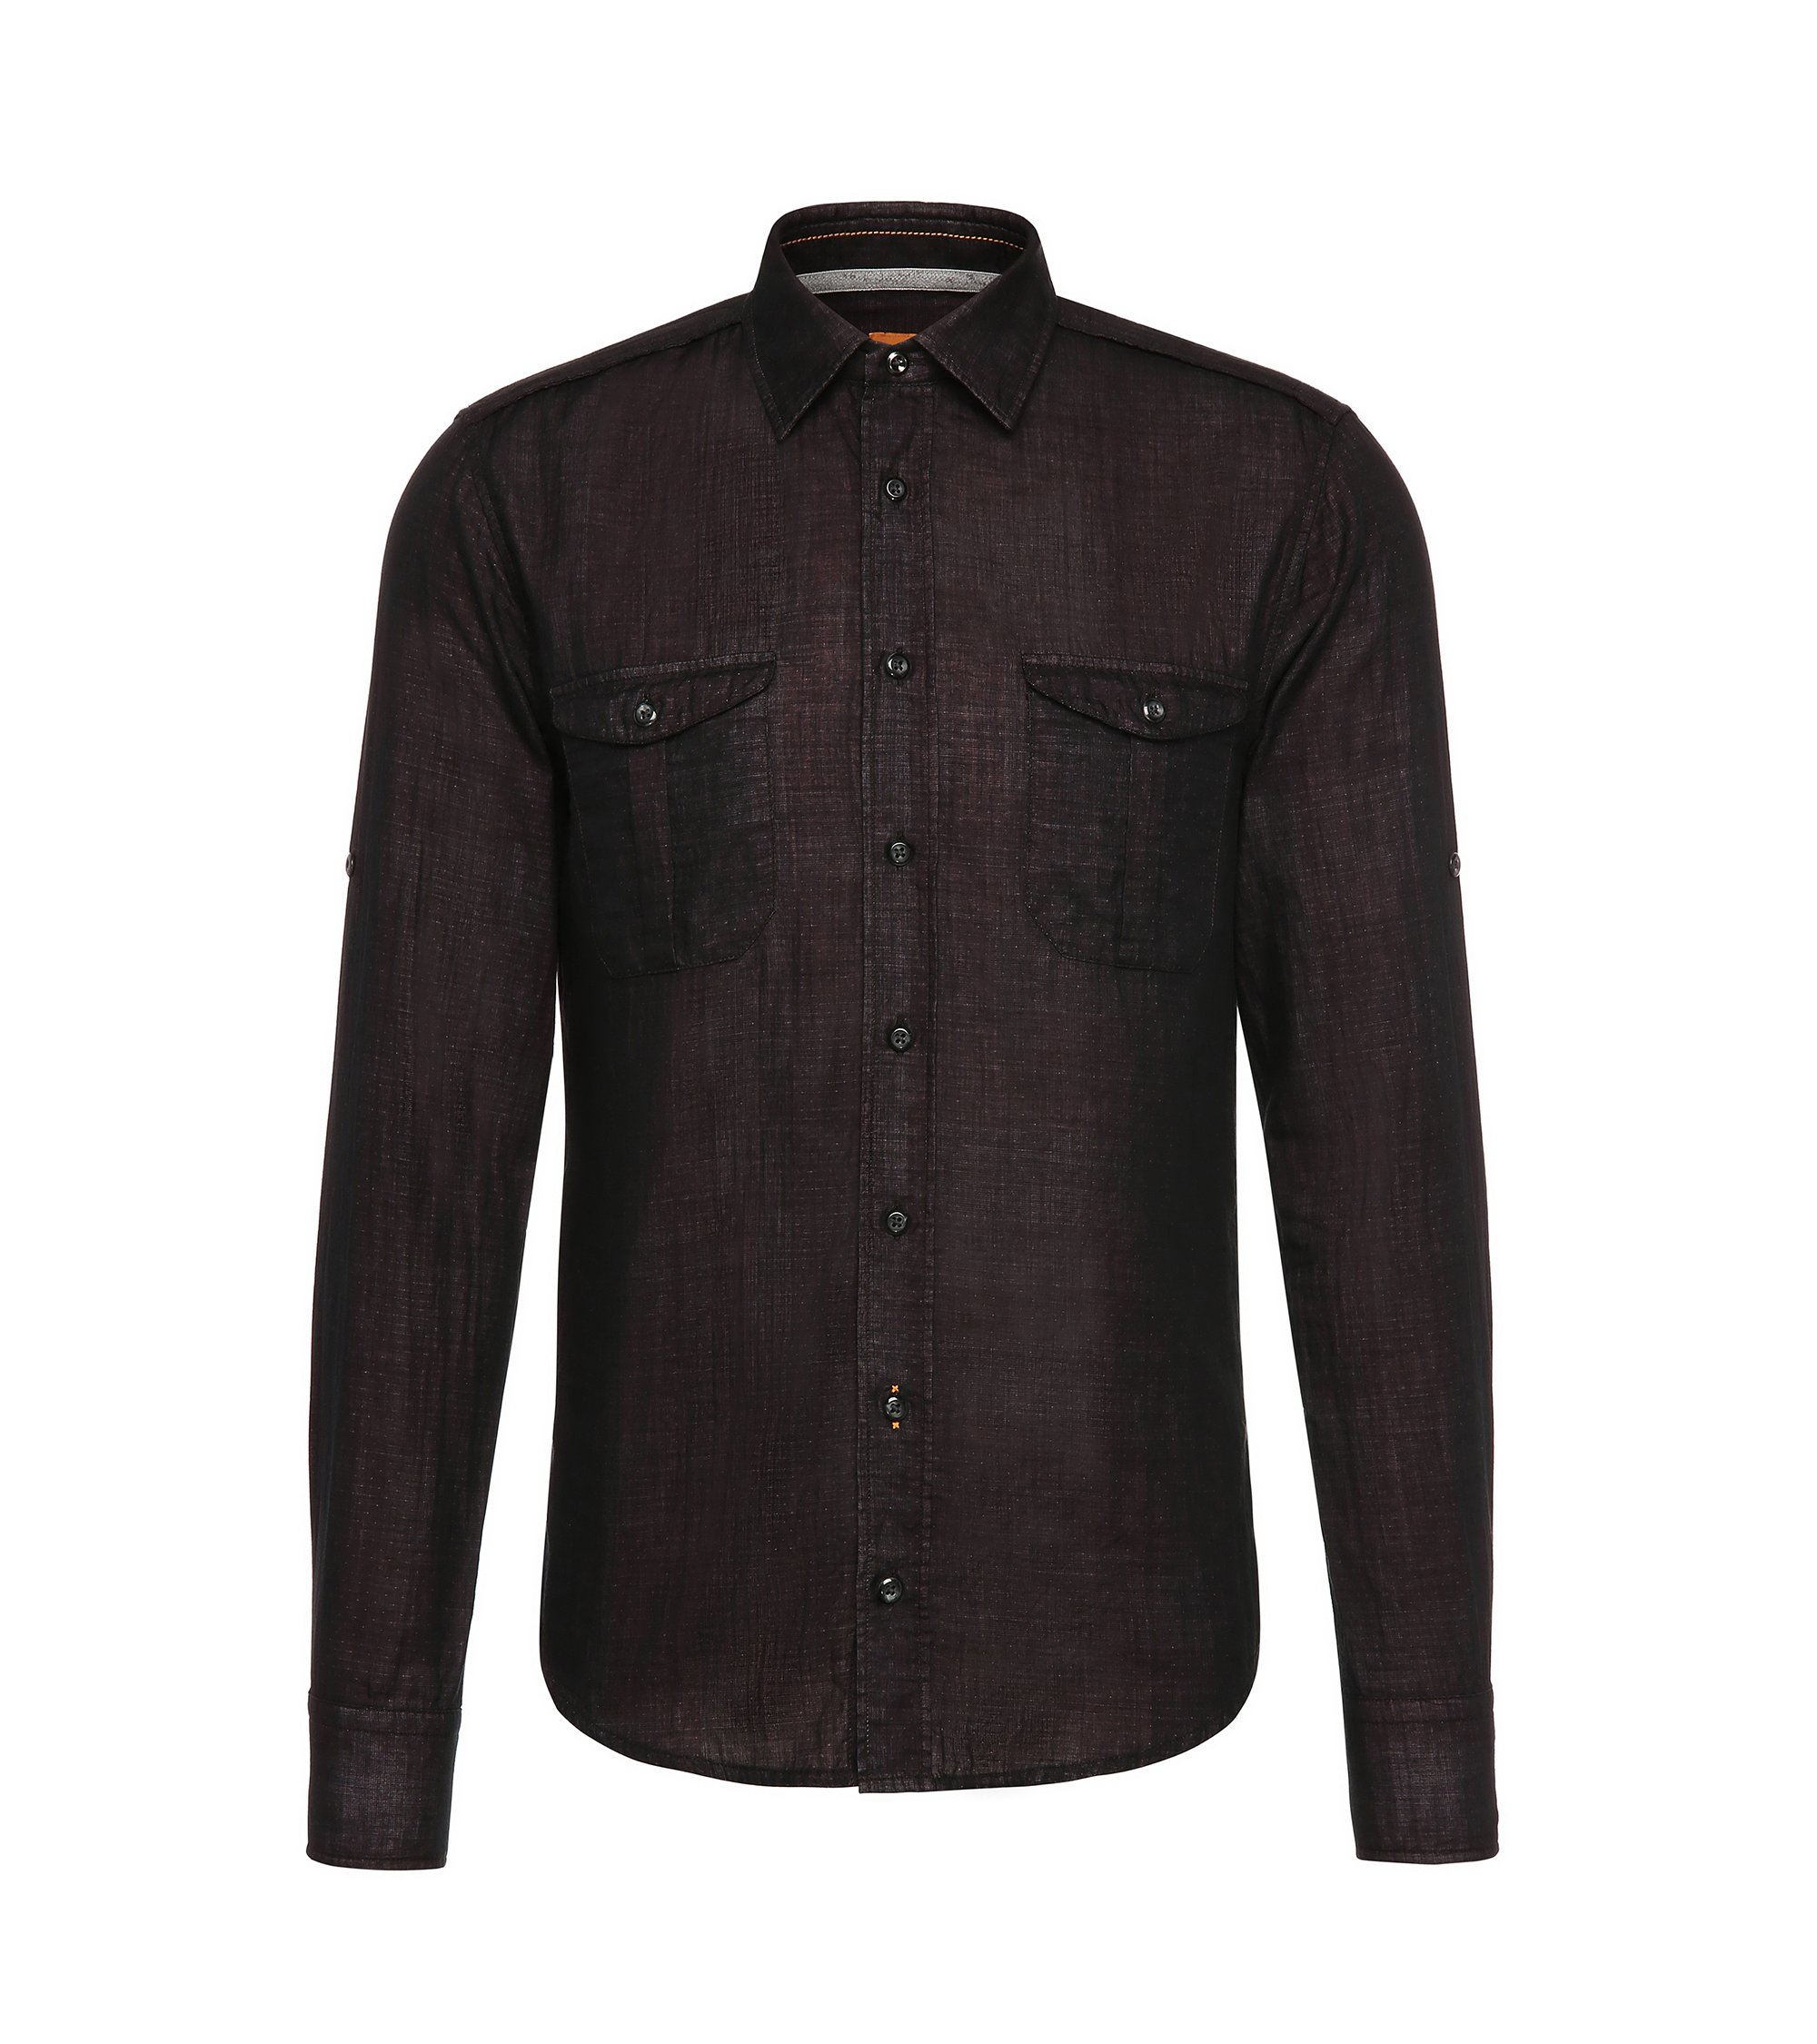 Cotton Sport Shirt, Slim Fit | CadettoE, Red